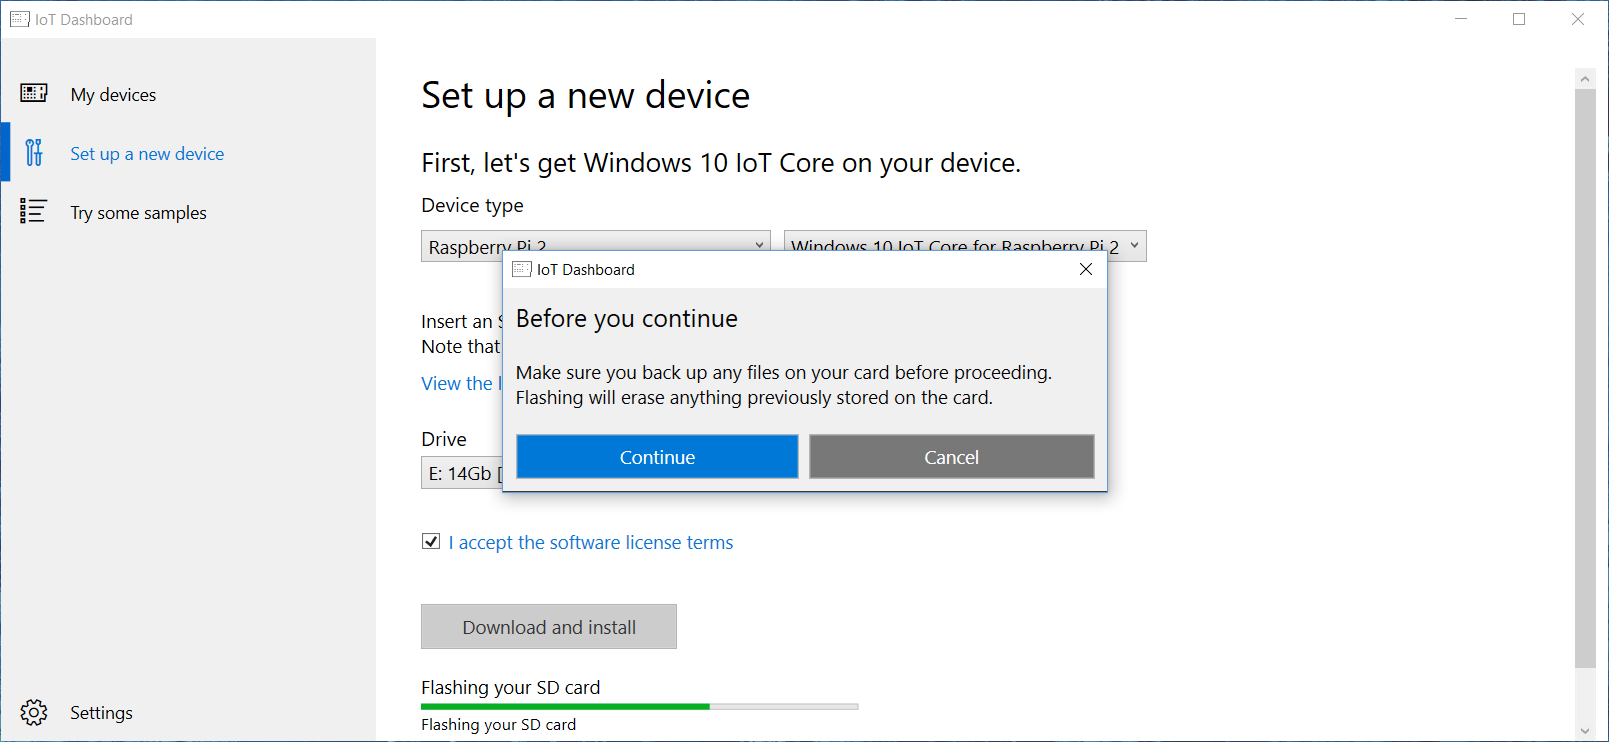 Raspberry pi windows 10 iot core download